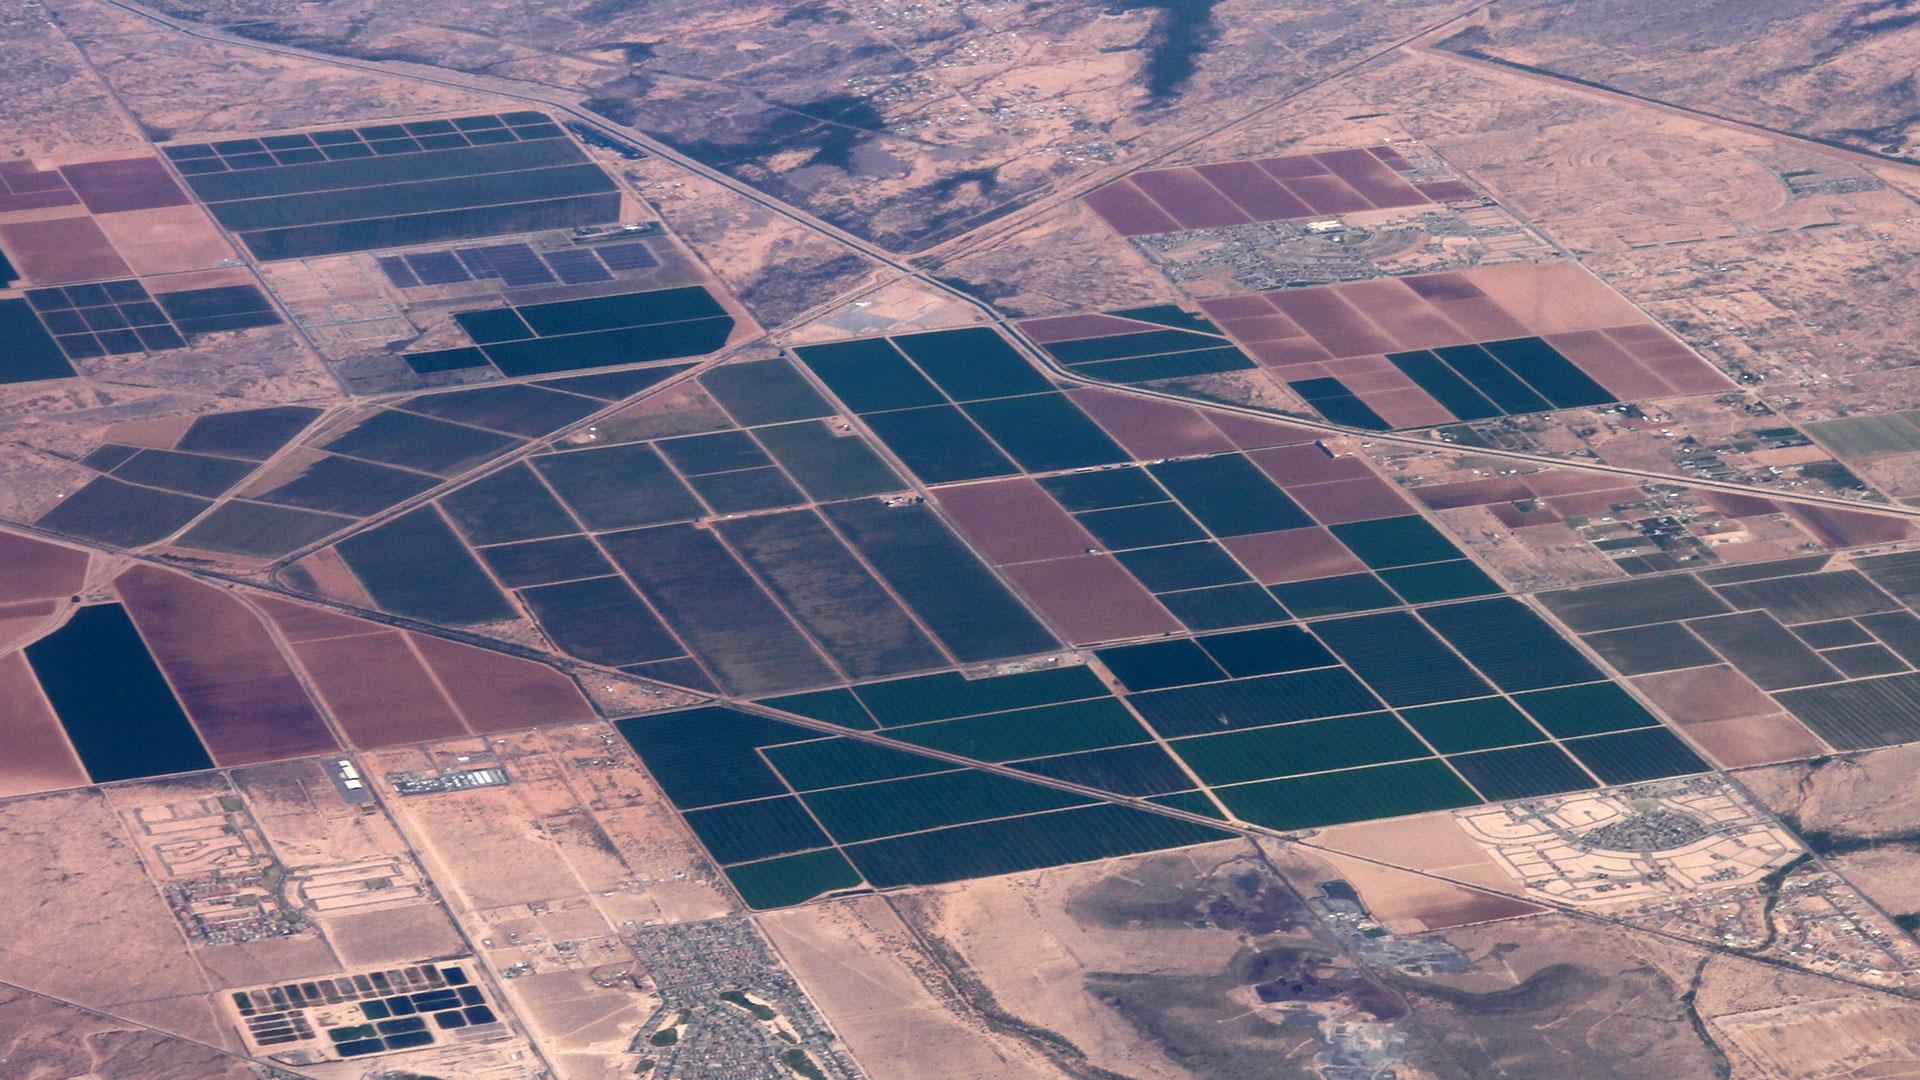 An alien's-eye view of an irrigated farm in the Arizona desert.